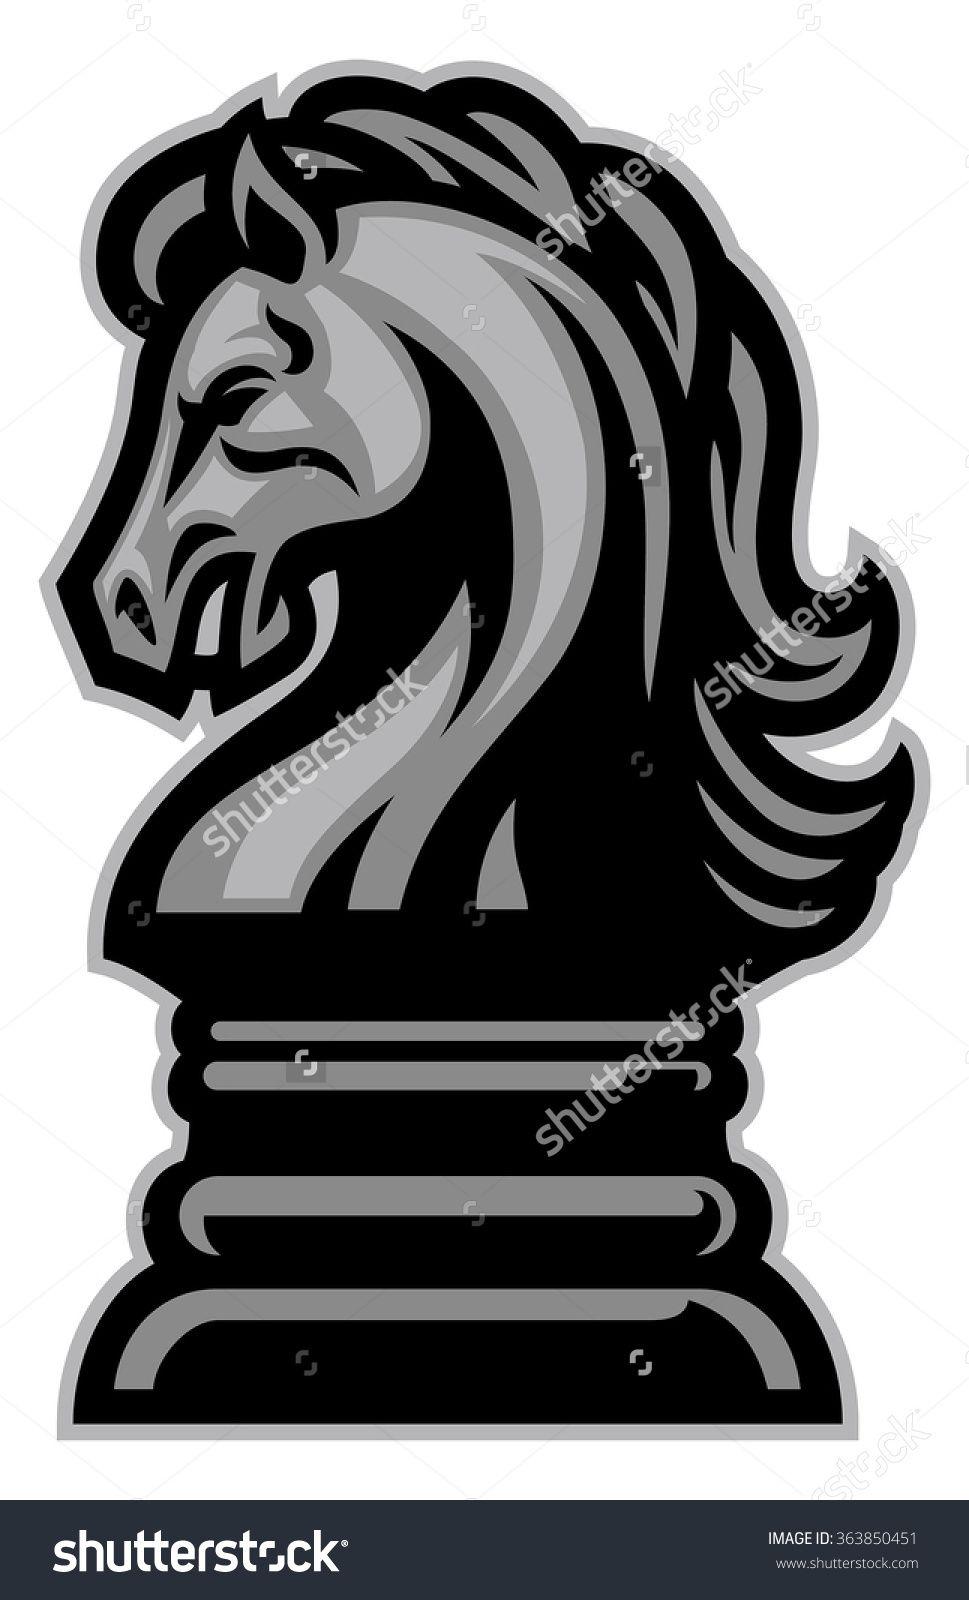 Knight Horse Chess Stock Vector Illustration 363850451